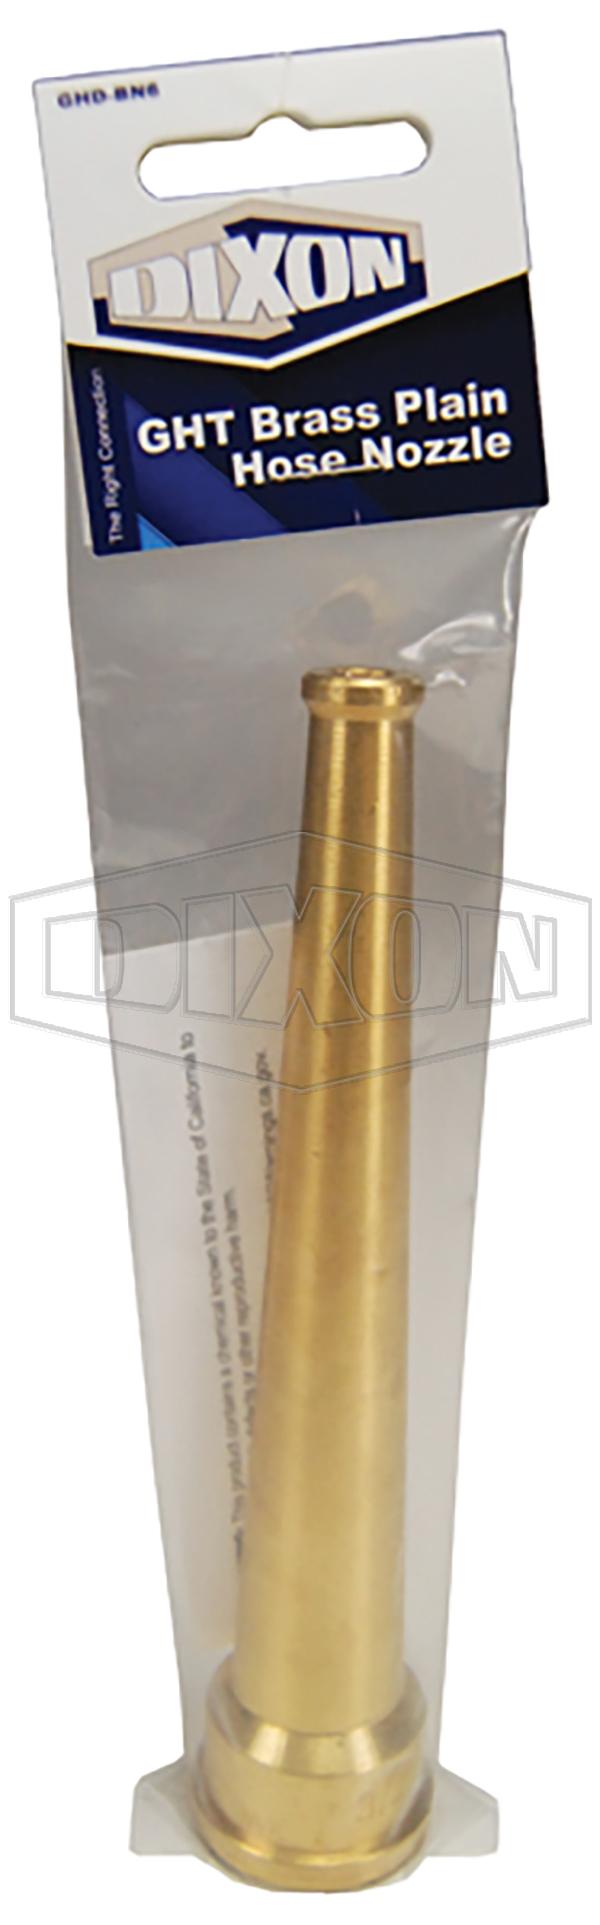 GHT Brass Plain Hose Nozzle - Retail Packaged